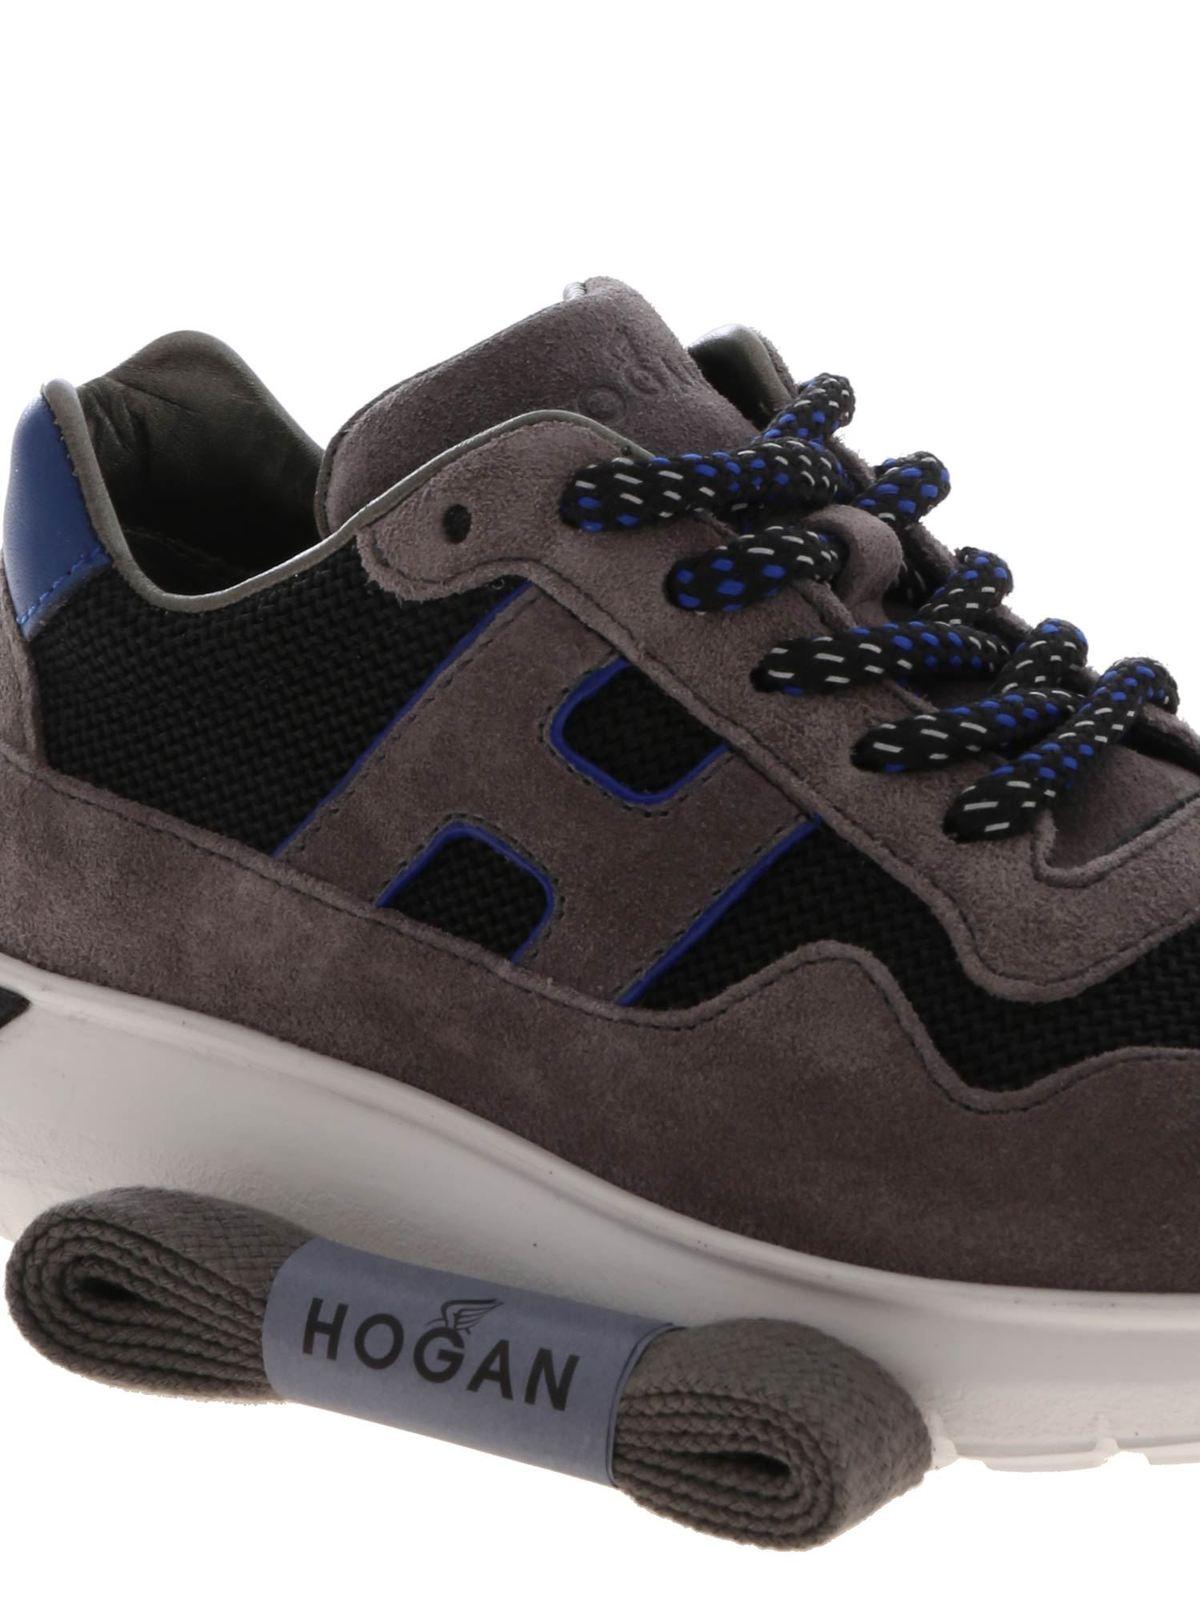 Hogan Junior - J371 sneakers in grey and black - trainers ...